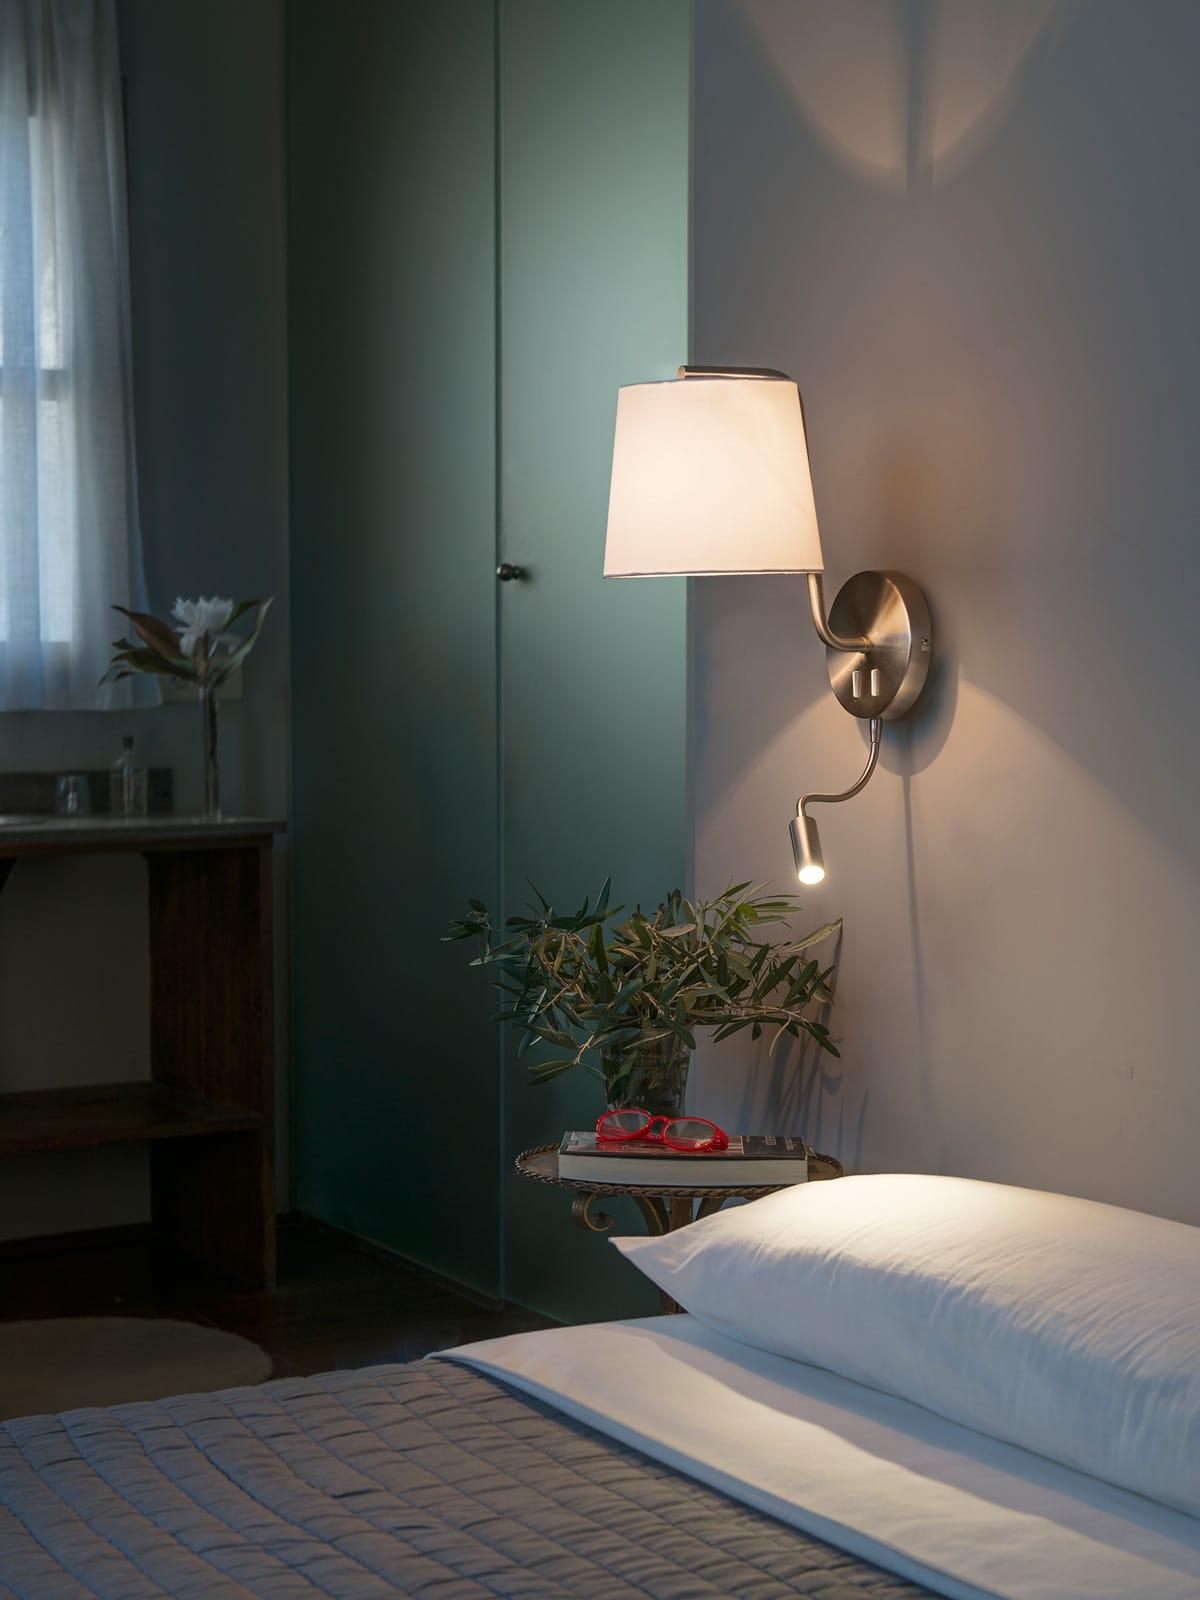 DesignOrt Blog: Designer im Portrait: Nahtrang Berni Wall Reader von Faro